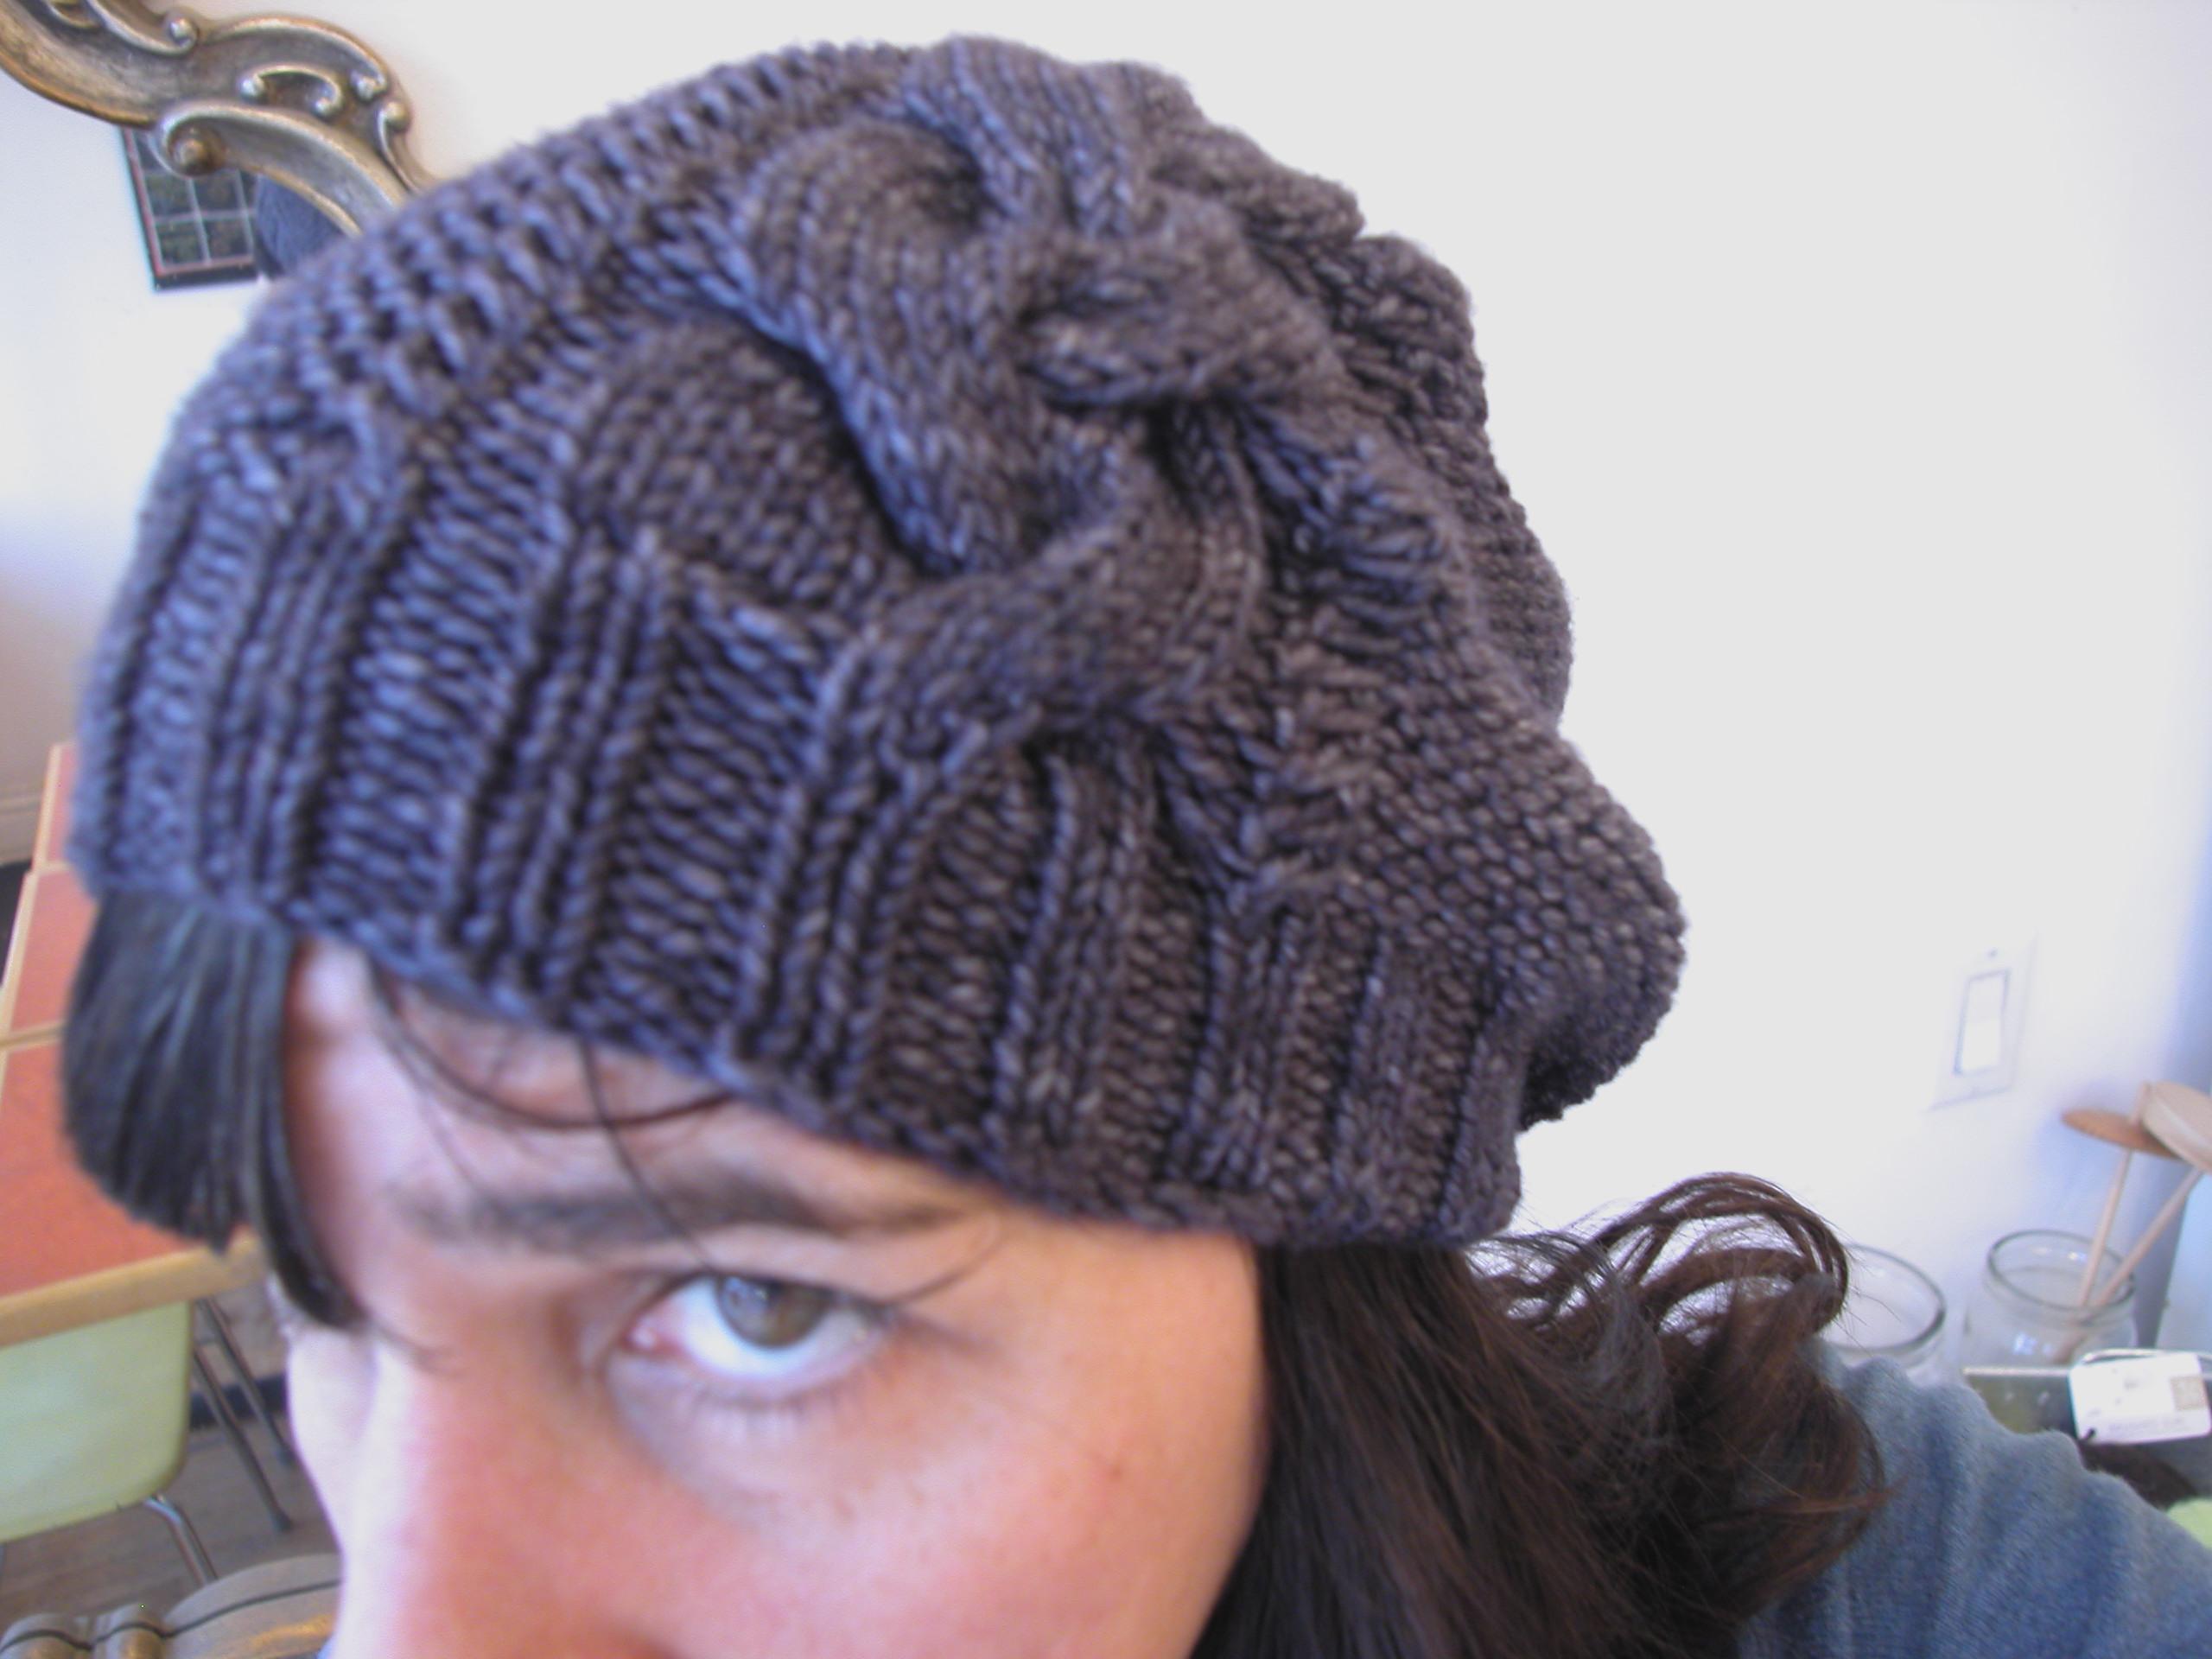 Free Knitting Patterns For Hats In Aran Wool : aran sweater patterns the knit cafe